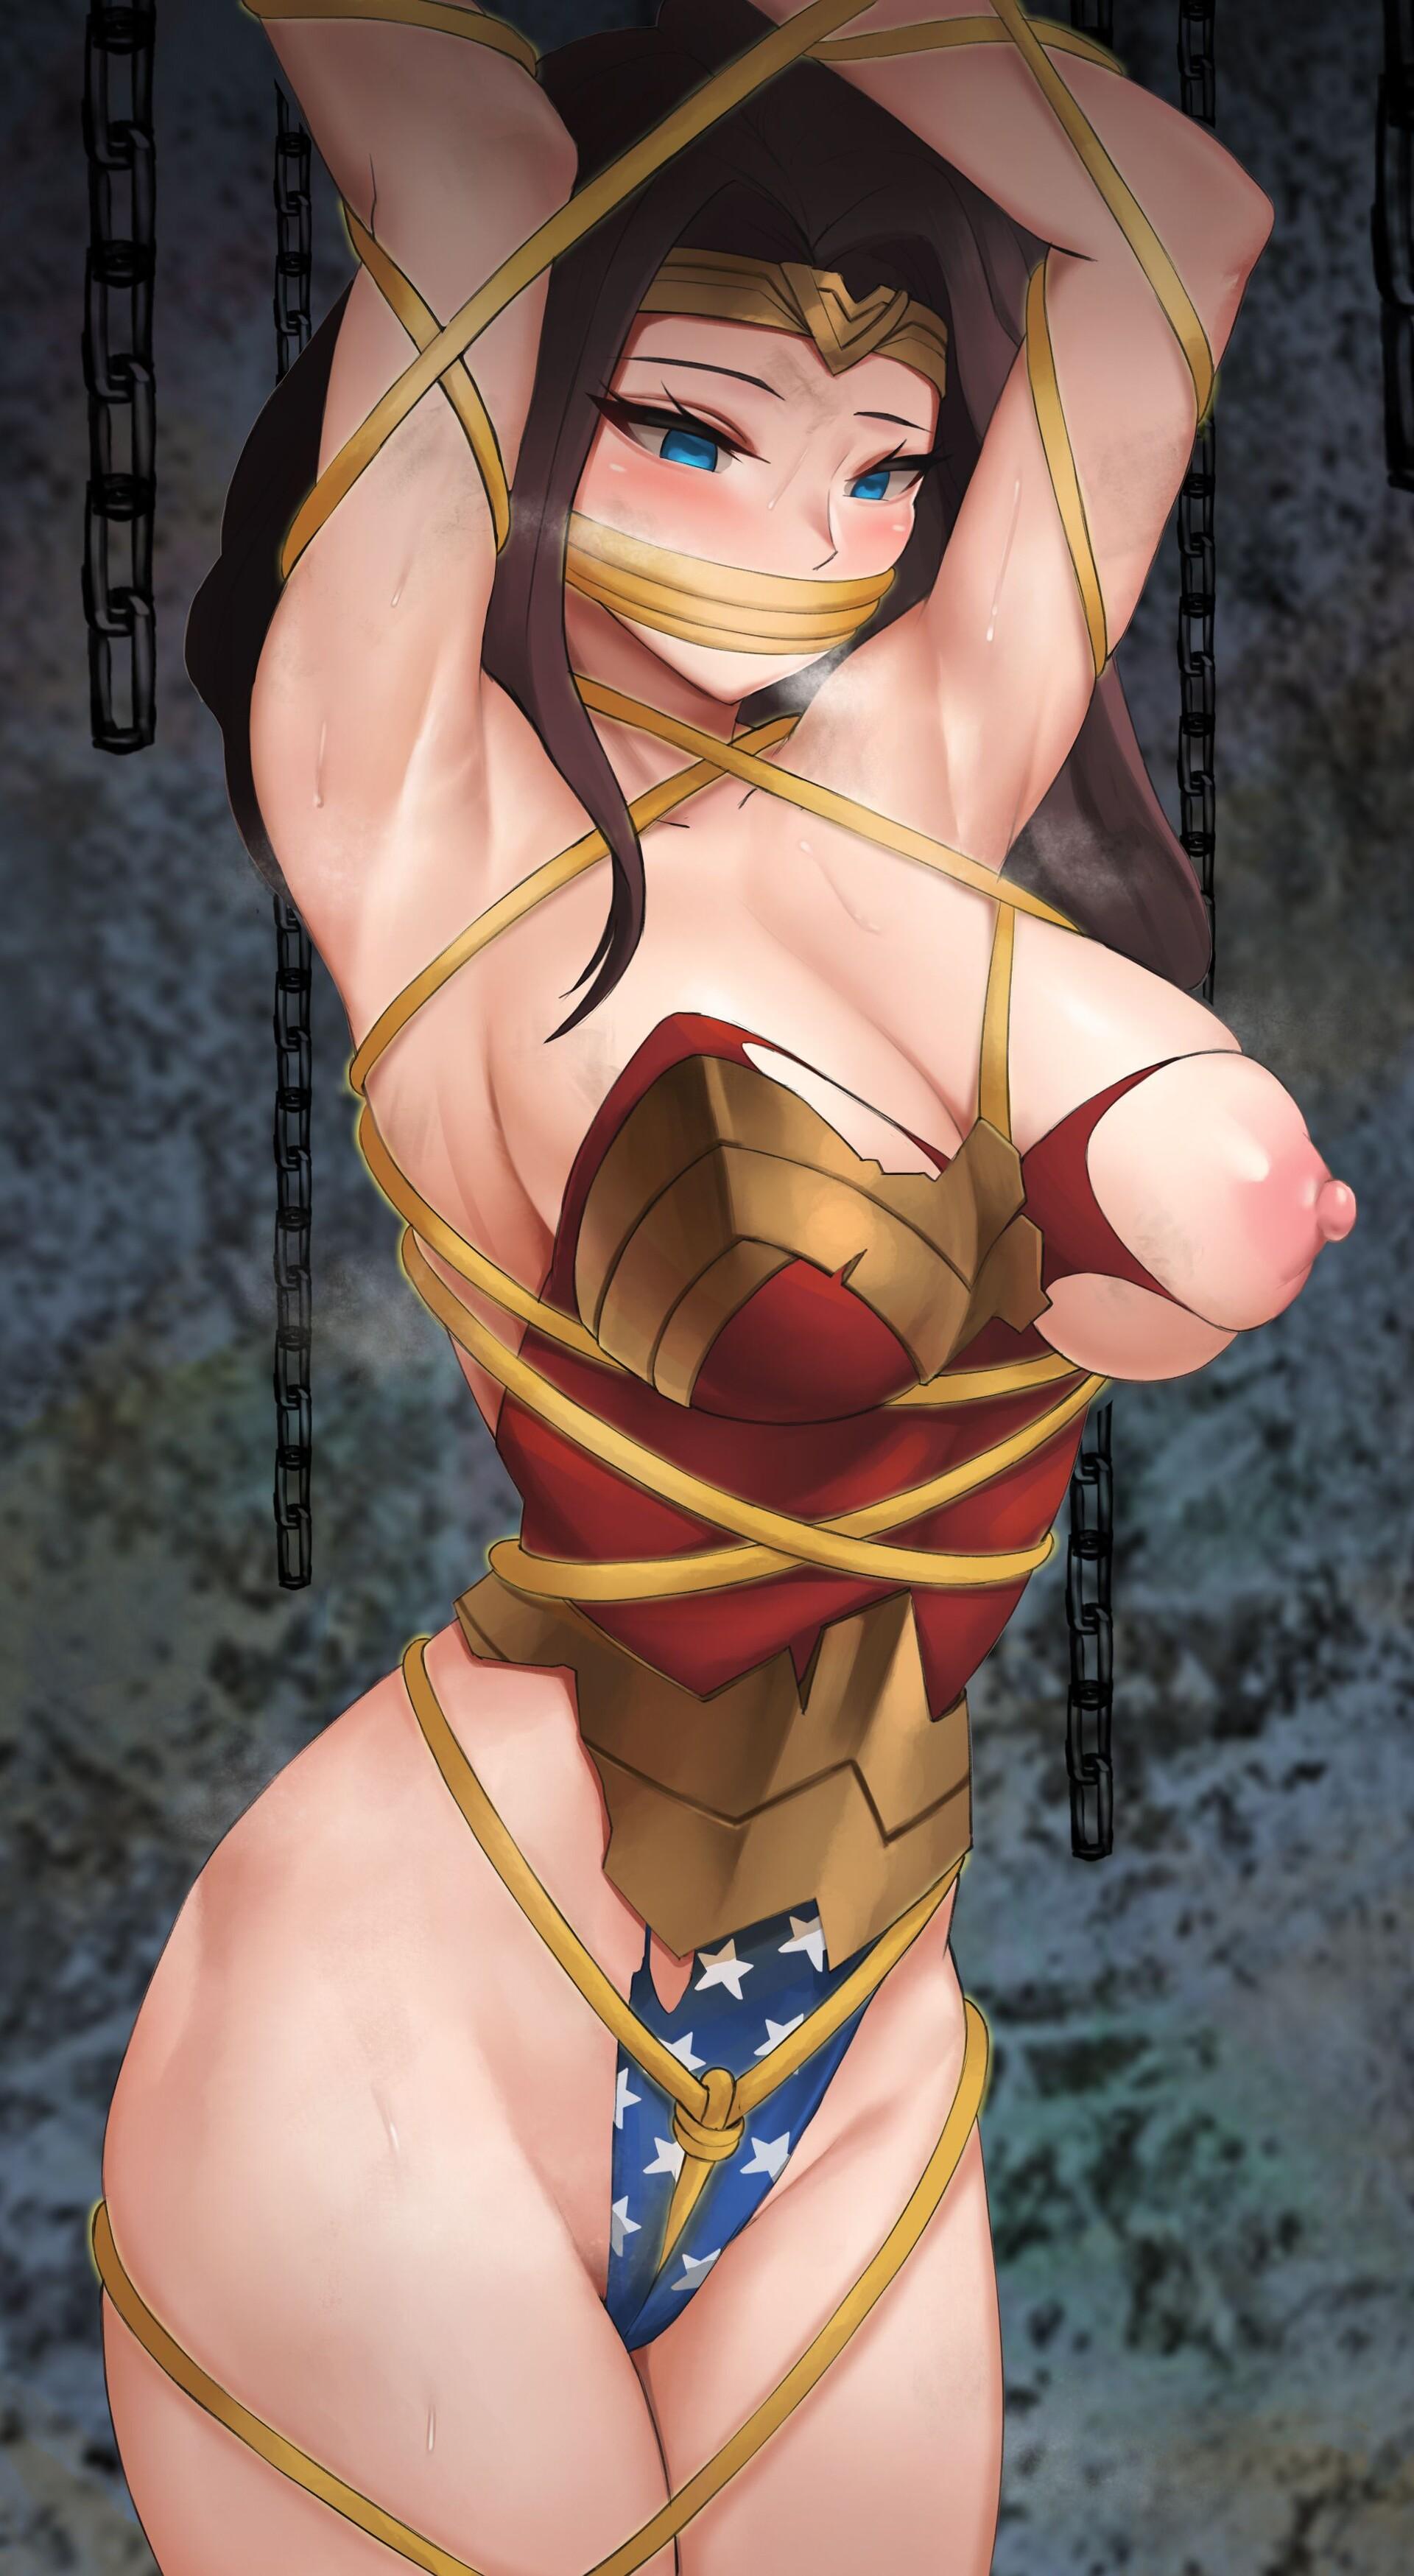 crotch_rope056